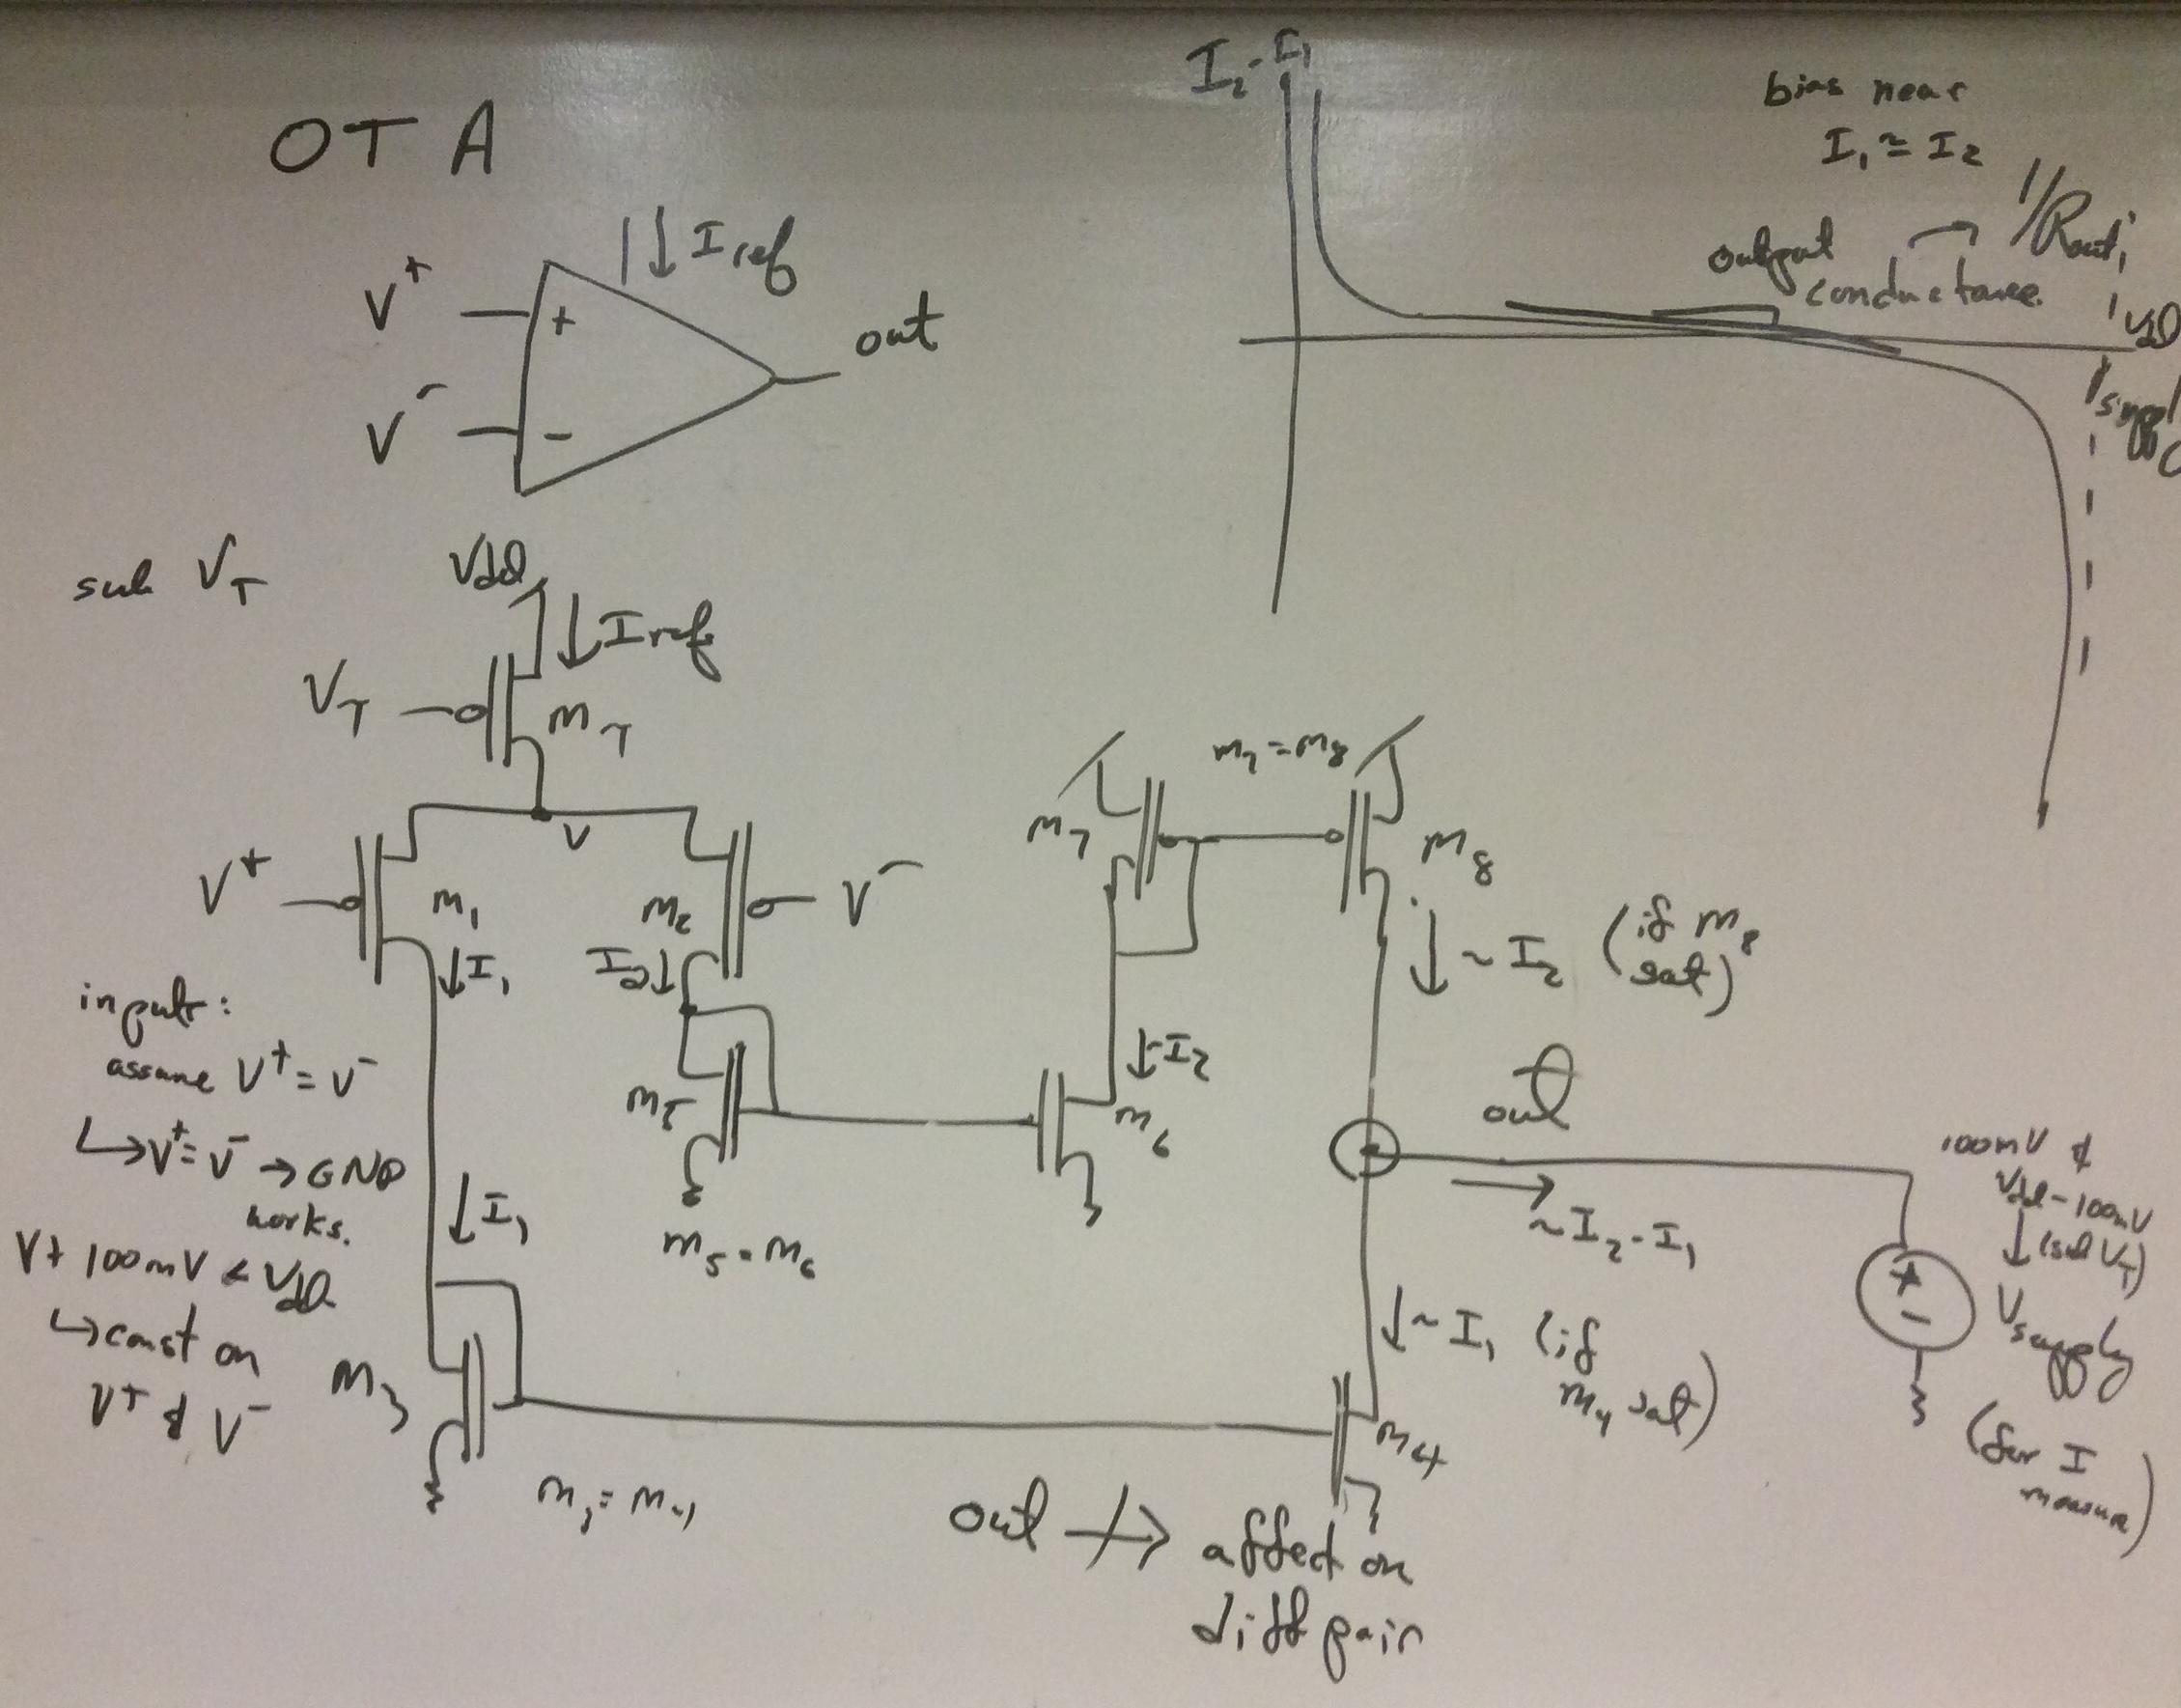 Basic Transistor Circuits Amplifier Circuit Design Schematic Diagram